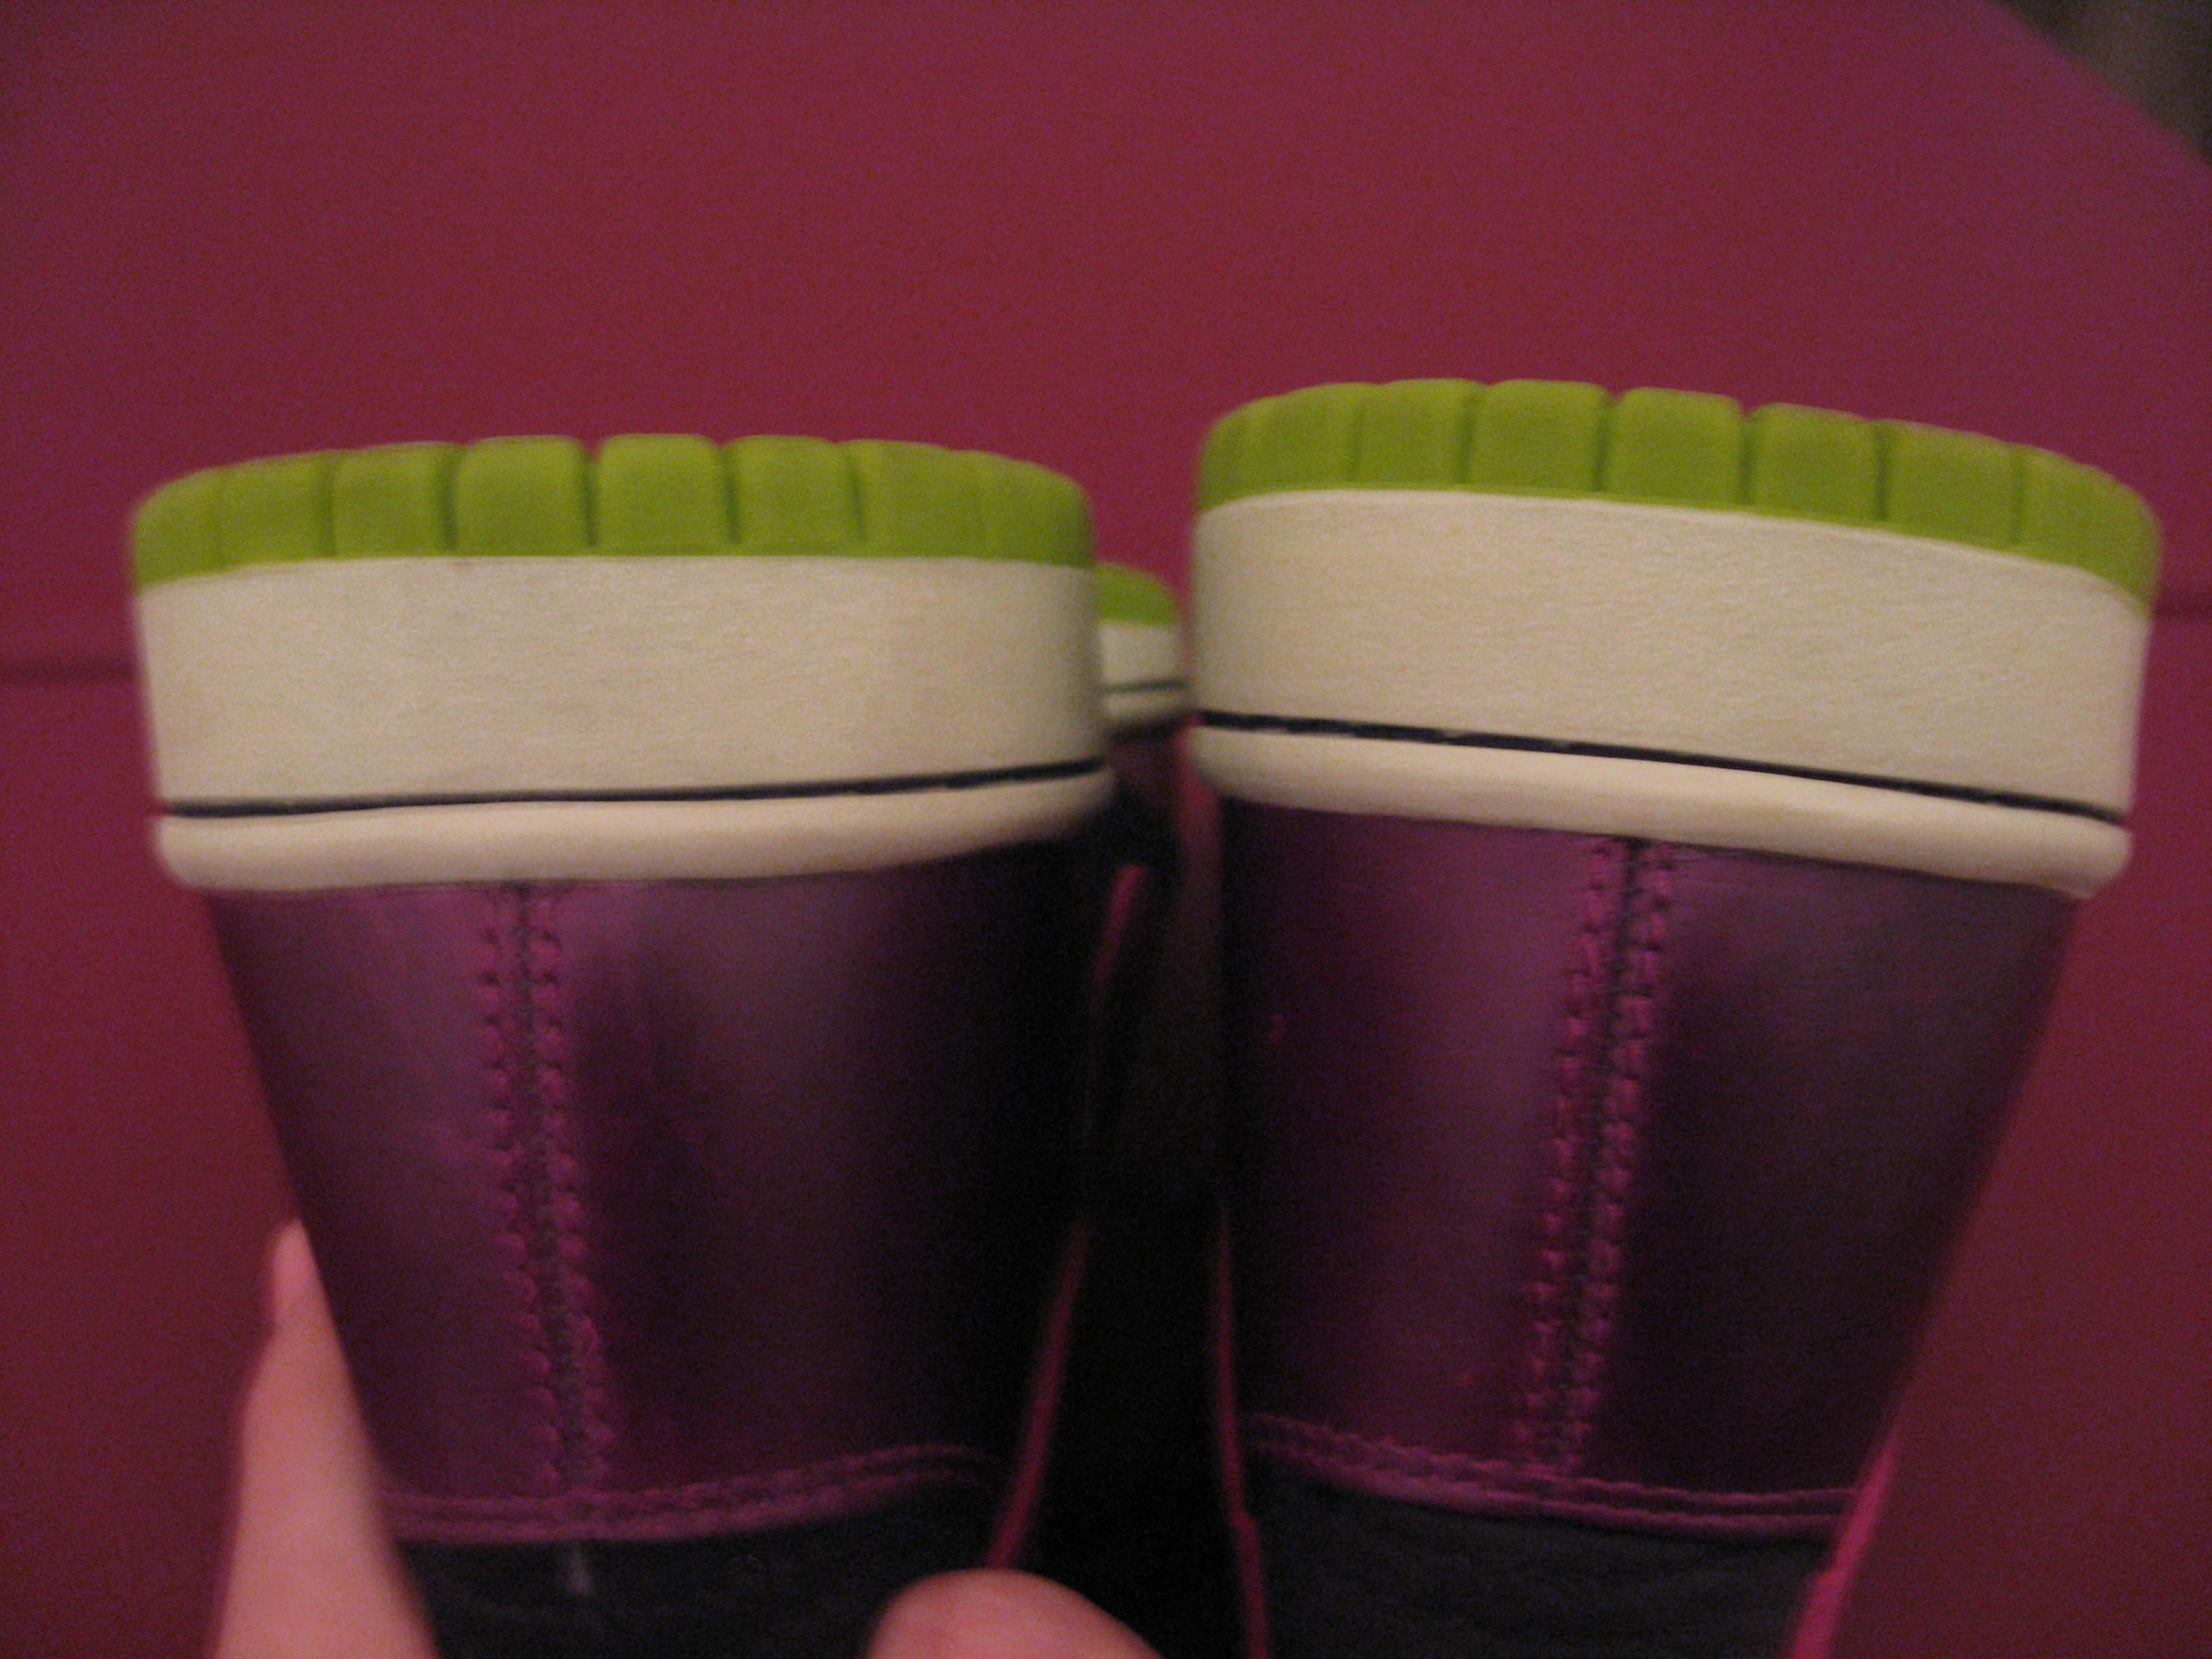 Nike UNDFTD 005.jpg